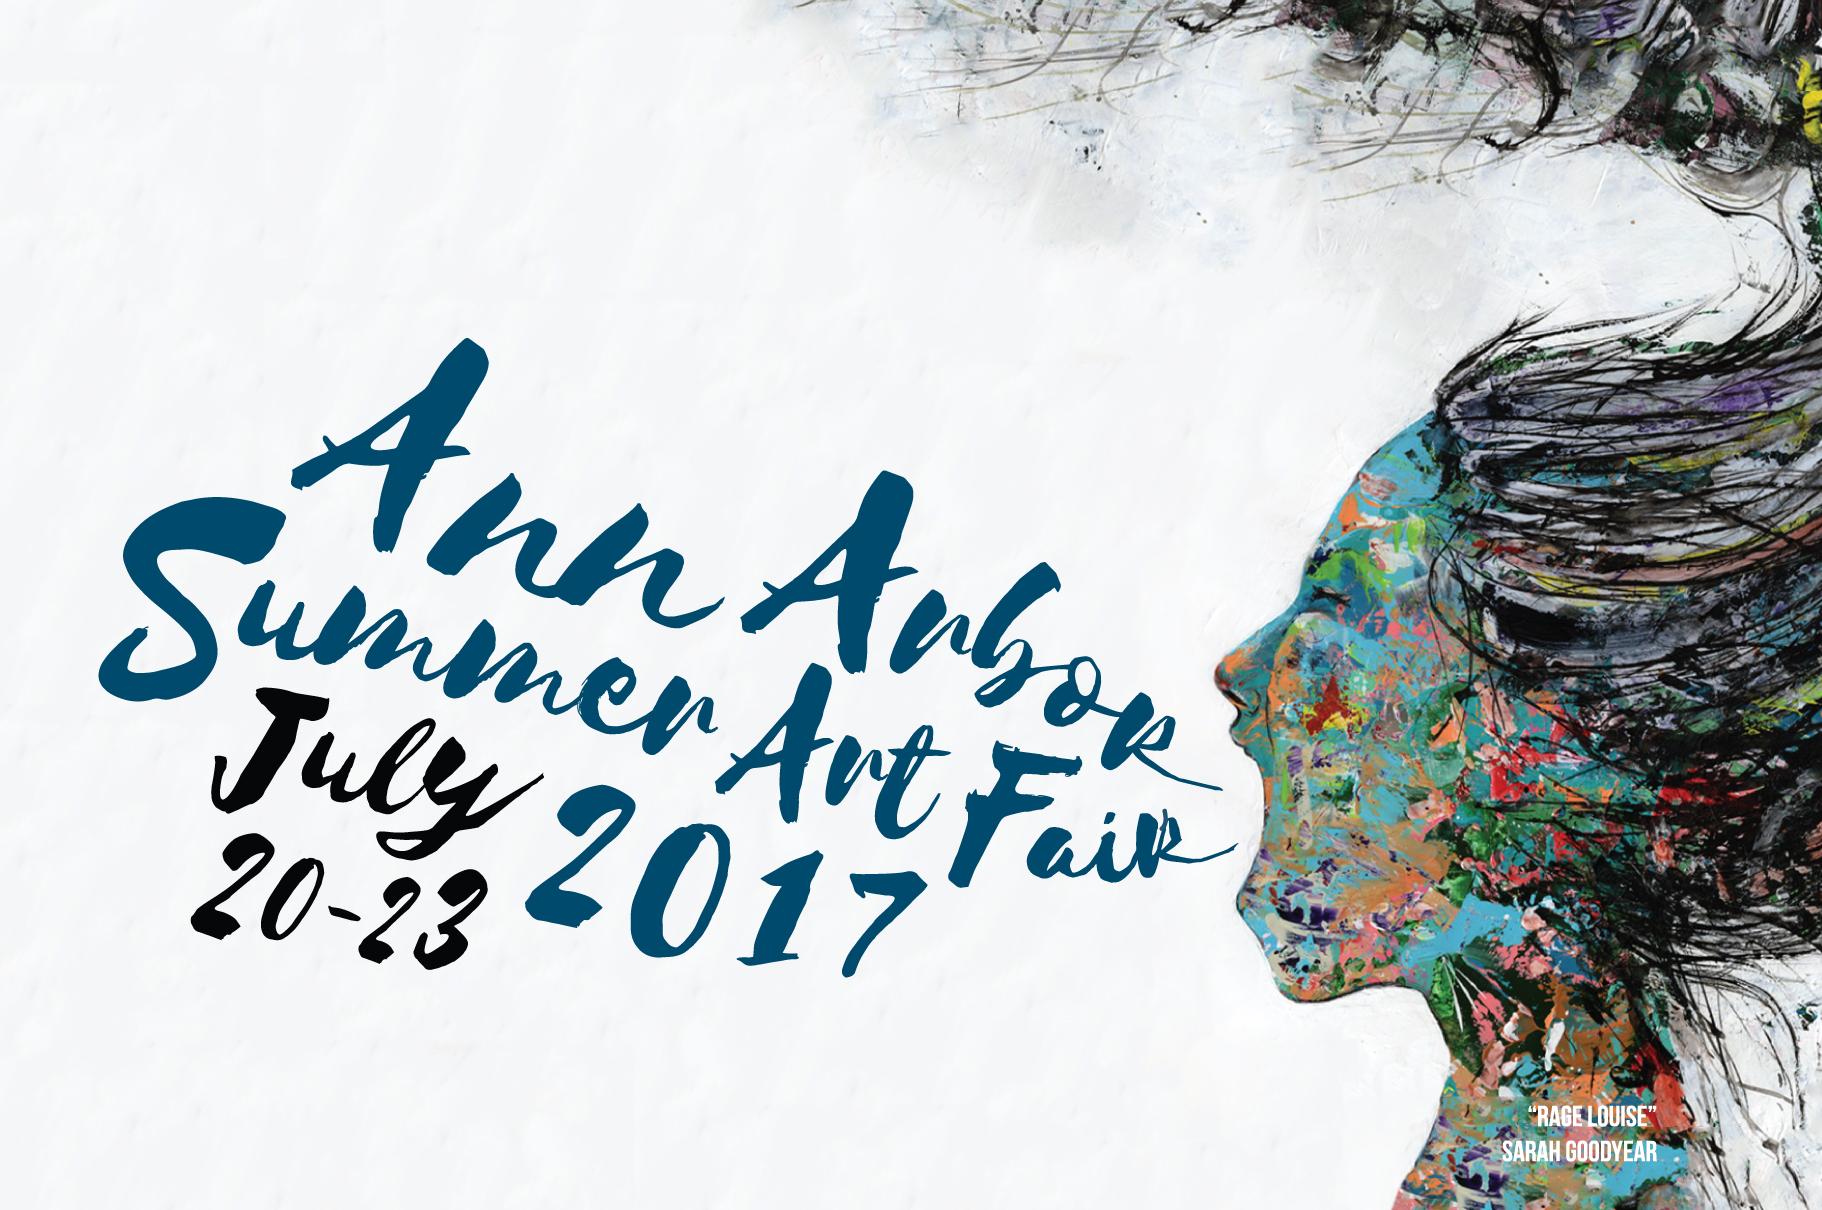 Ann arbor art fair 2017 festival information from the for Ann arbor painting